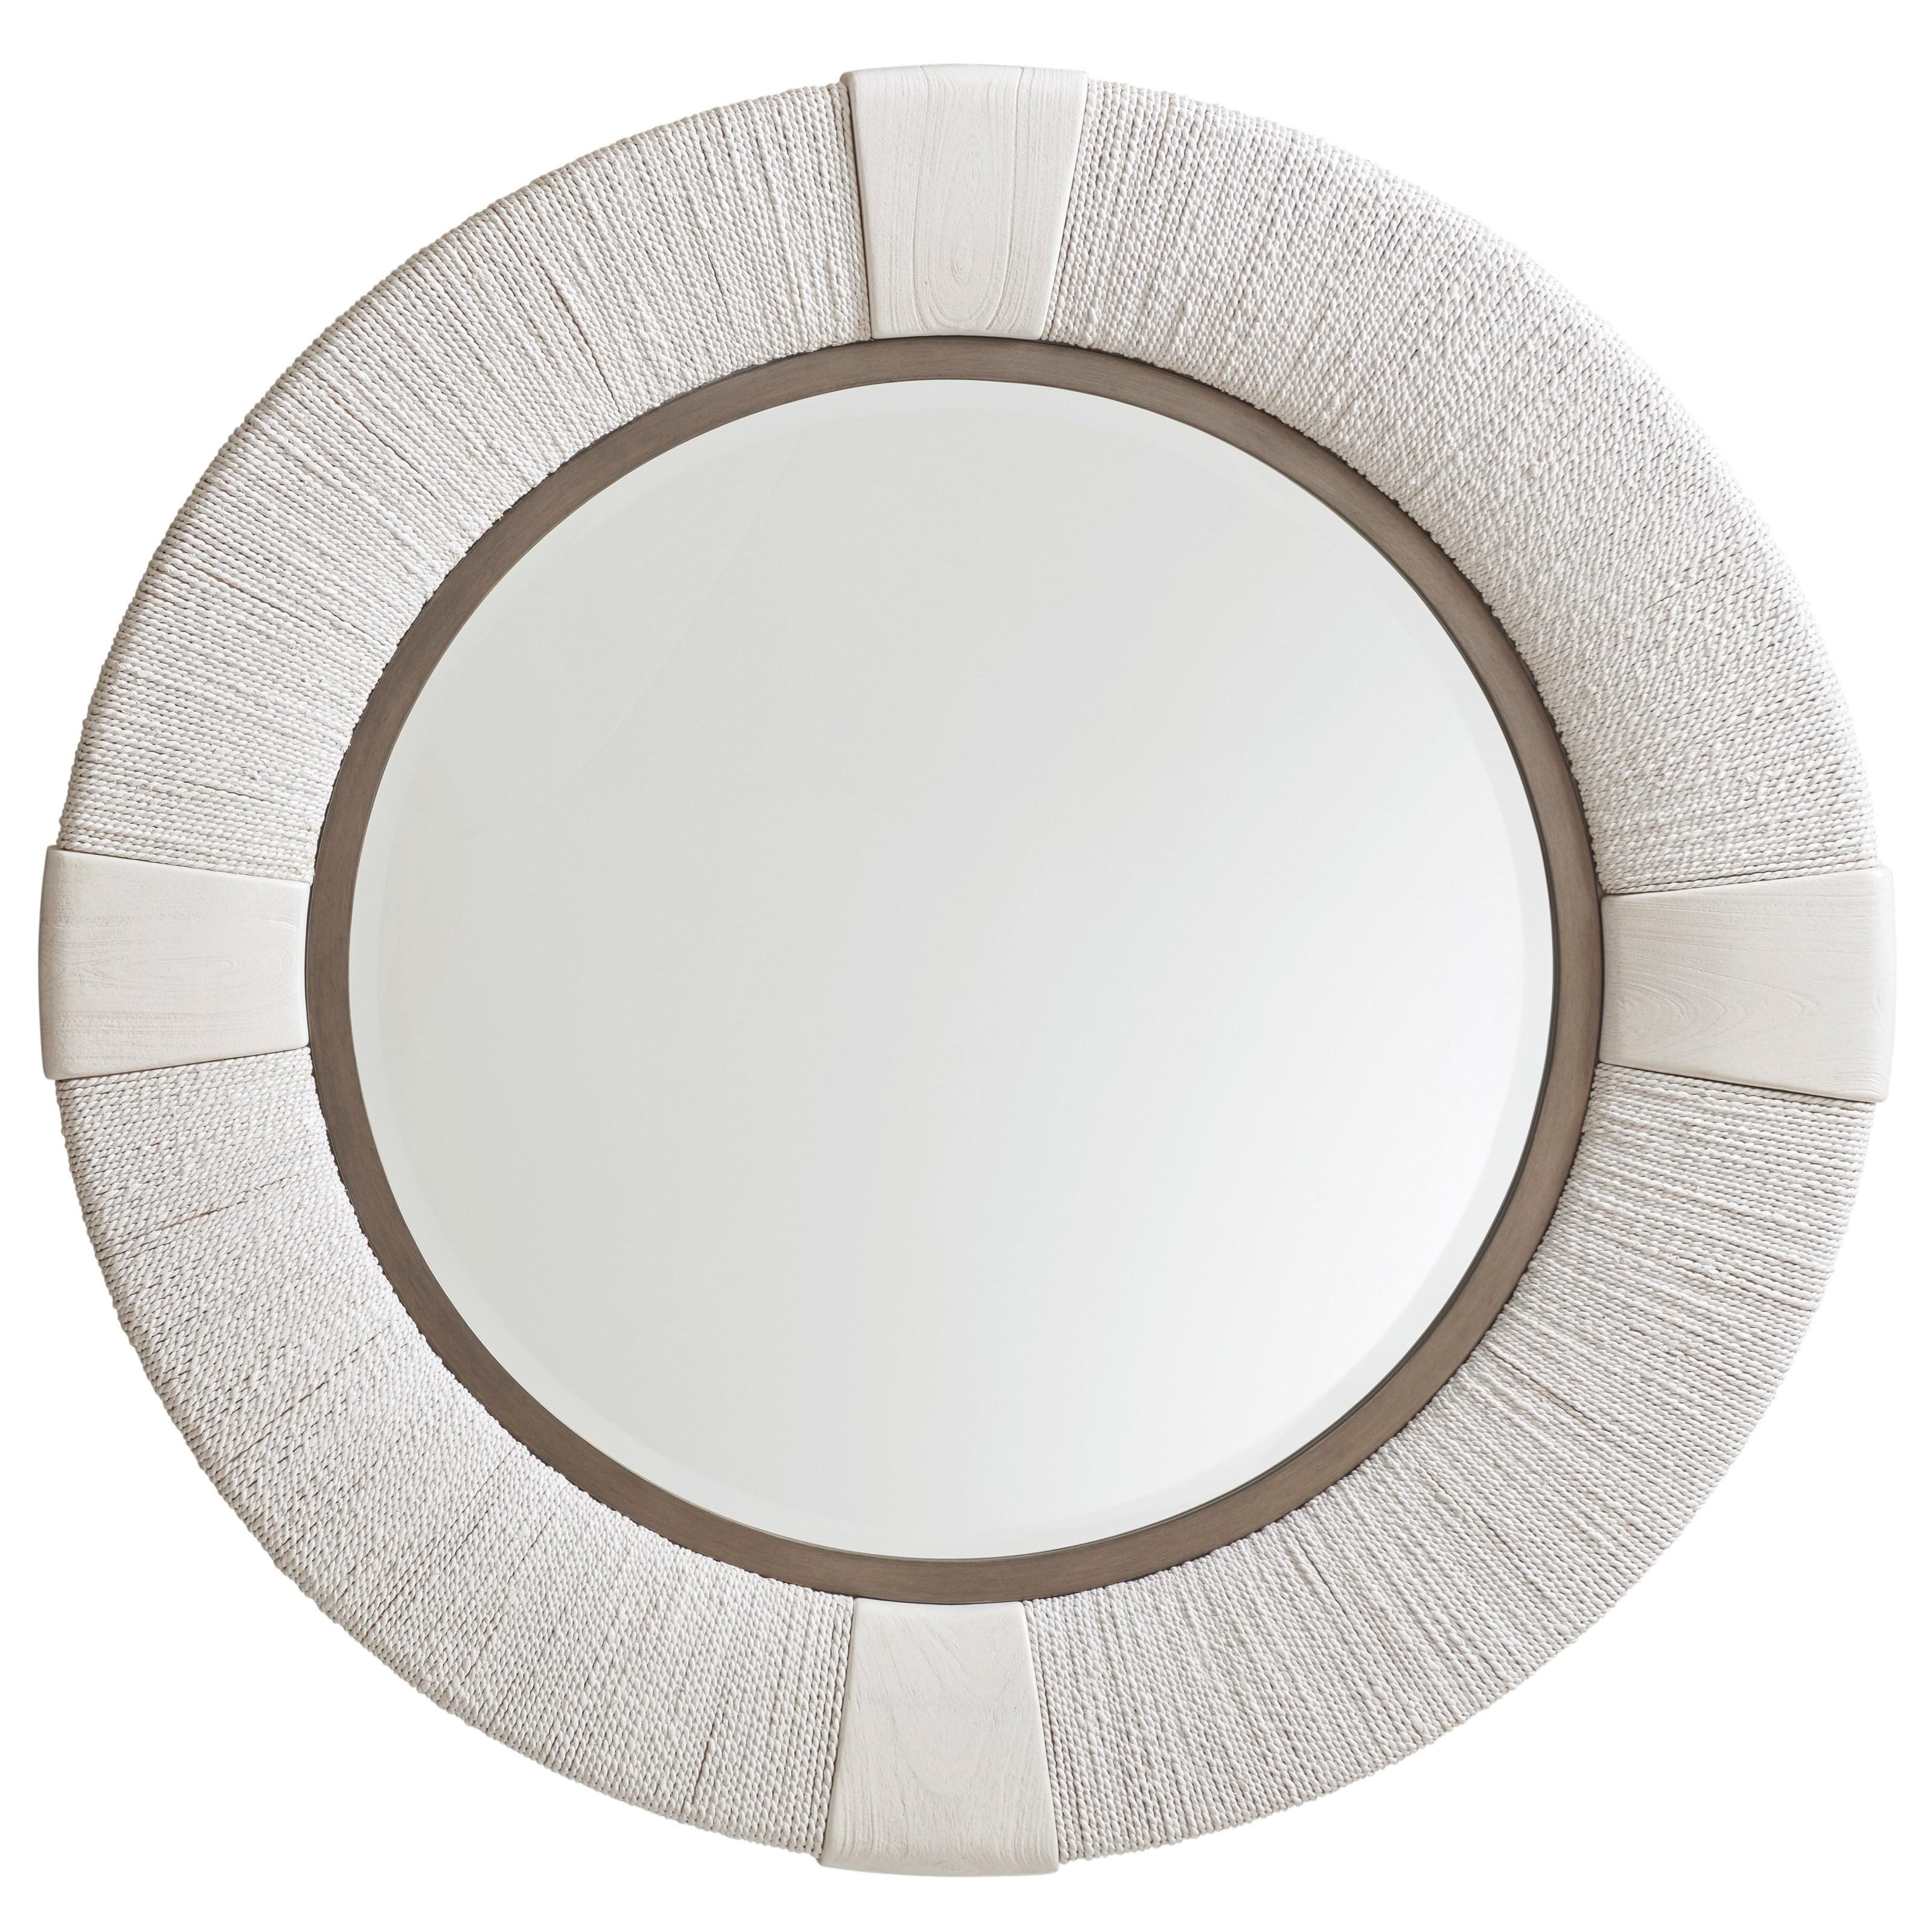 Seacroft Round Coastal Mirror with Wrapped Banana Leaf